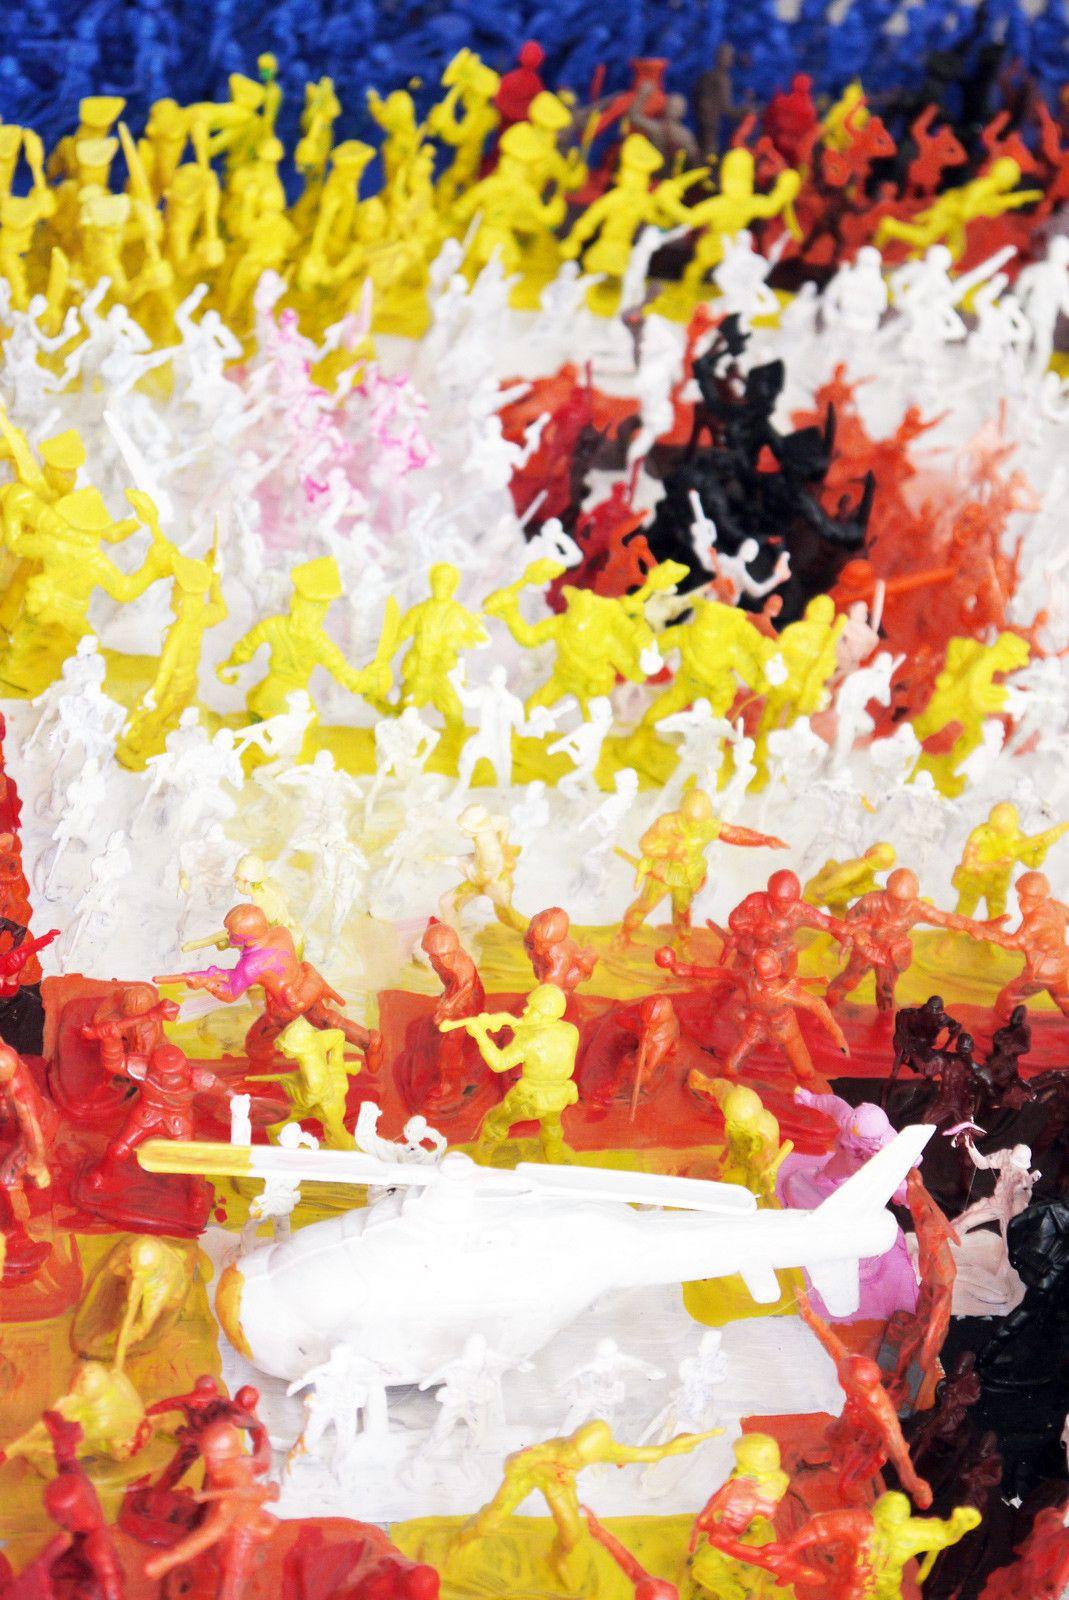 "MIXED MEDIA JORGE CASTRO GOMEZ "" SLAVA UKRAINI ""  dimensioni L 120 x H 120 x P 10 cm."